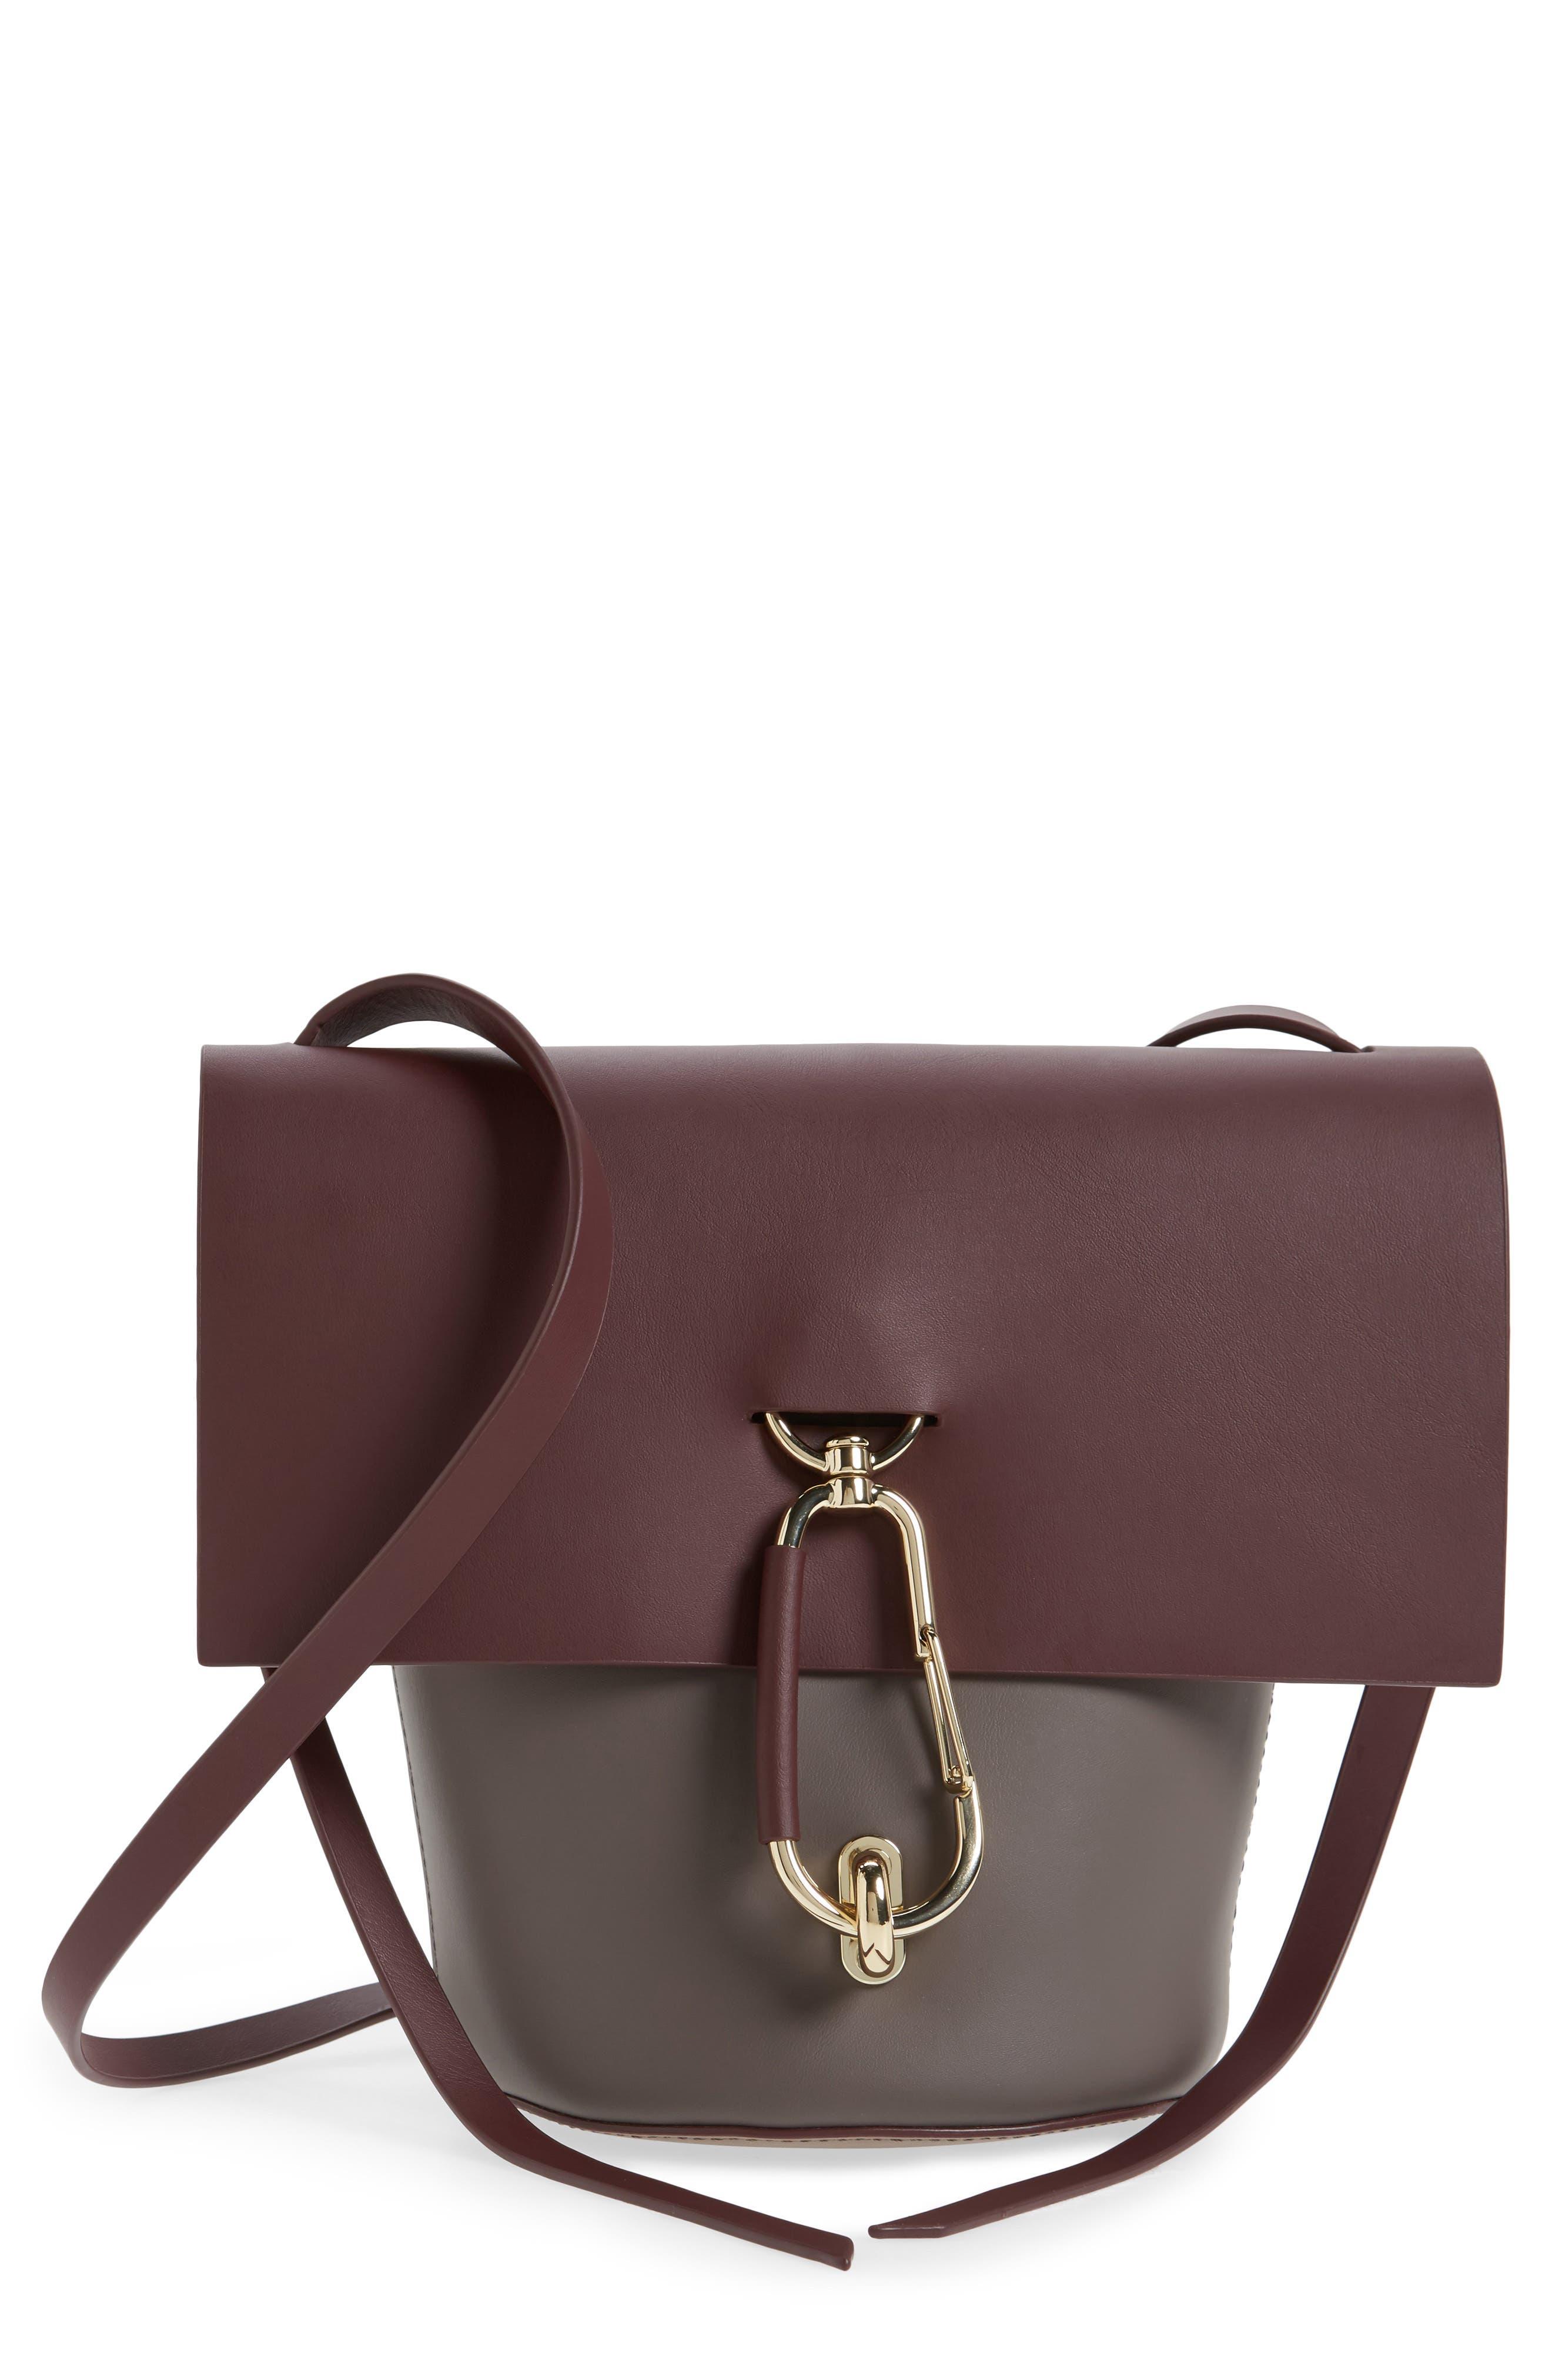 Main Image - ZAC Zac Posen Belay Colorblocked Leather Crossbody Bucket Bag